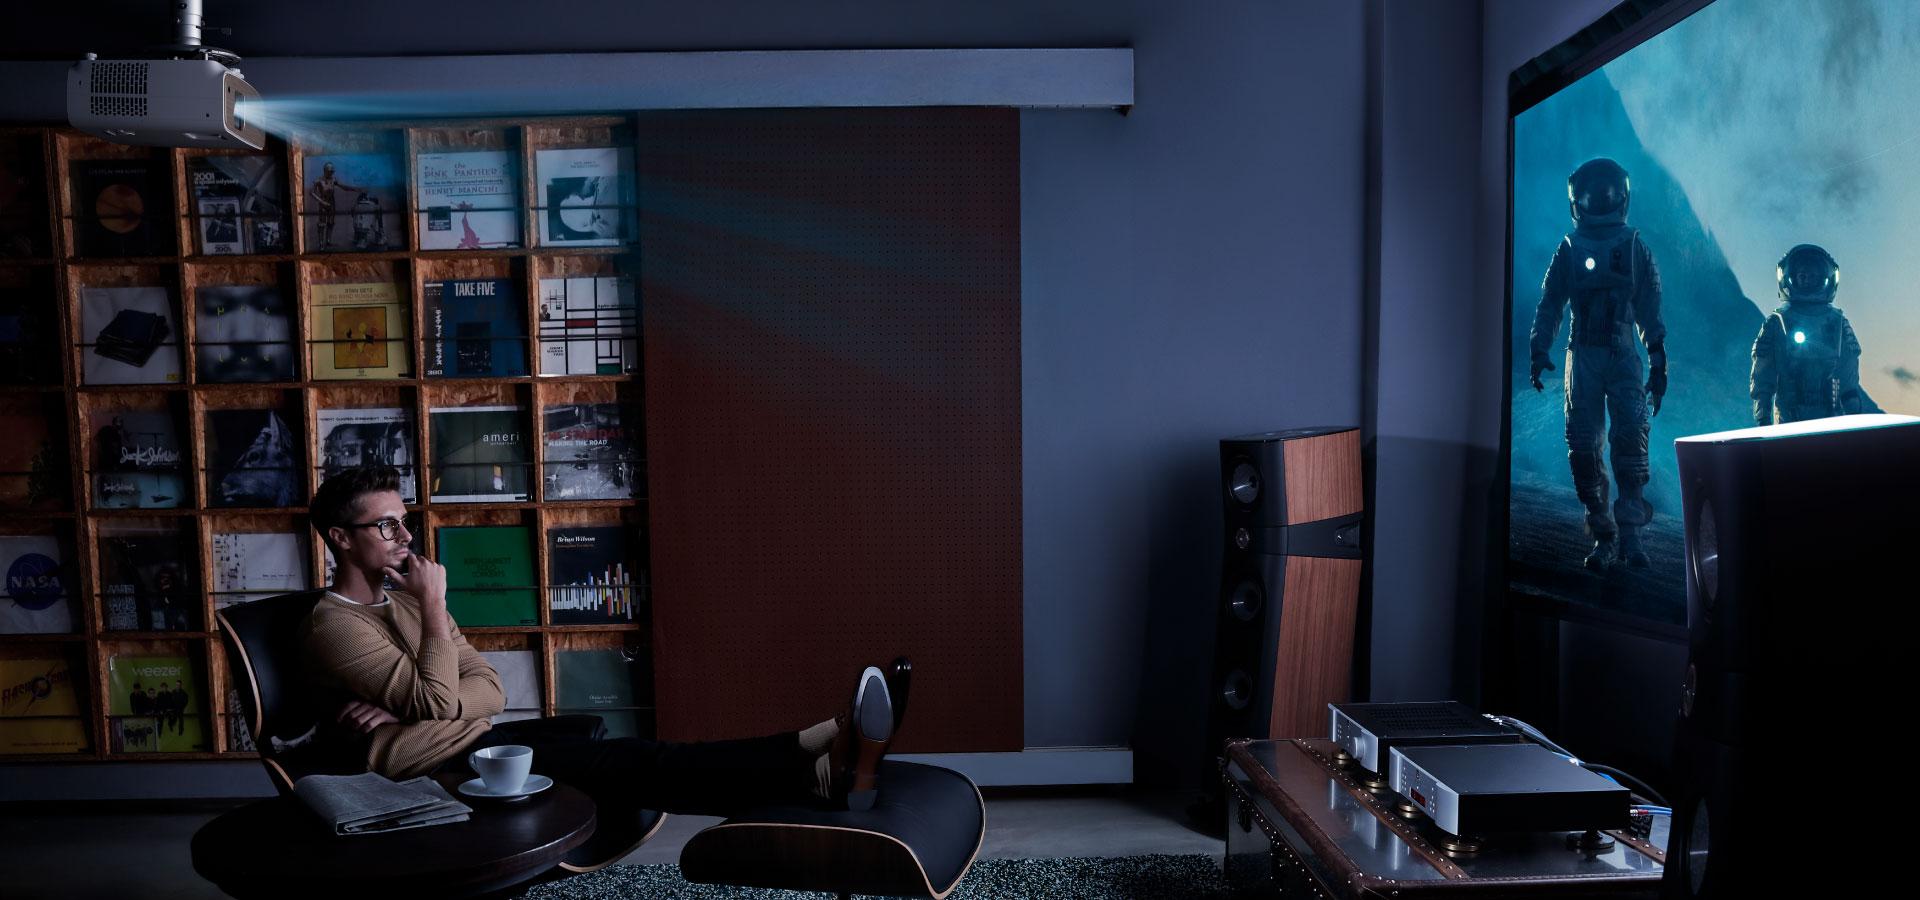 BenQ projector models cinematic cinema